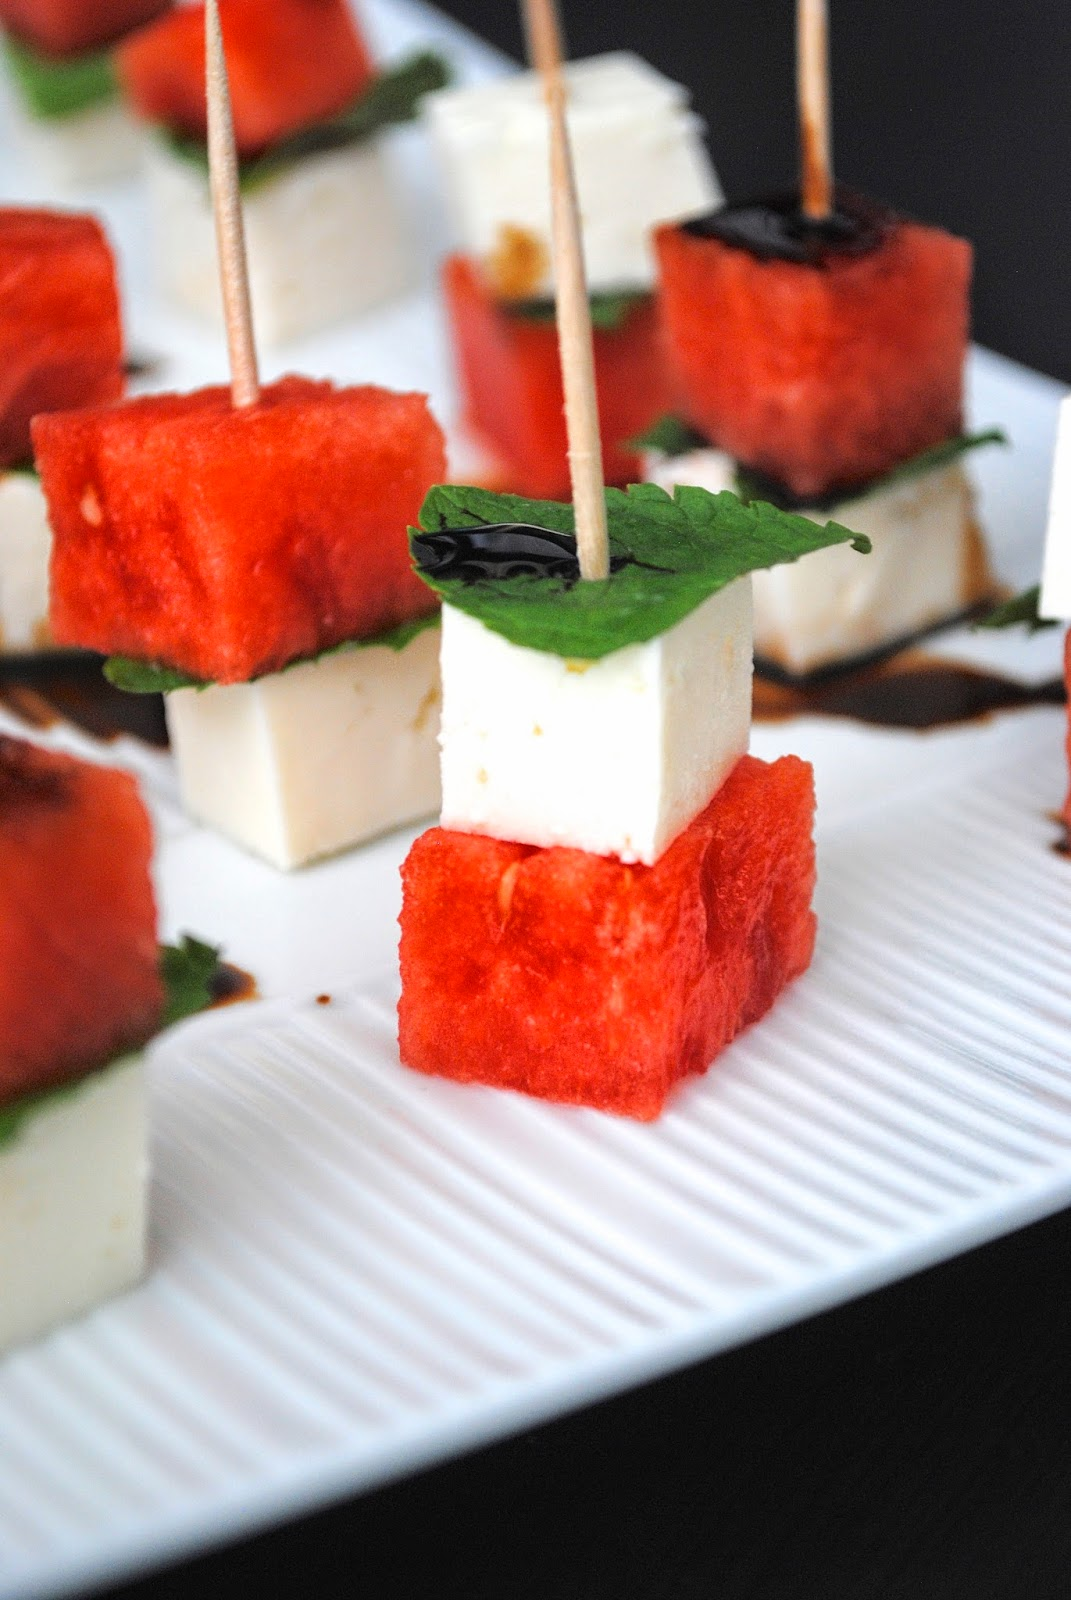 Kitchin-it: Watermelon Feta Mint Skewers!